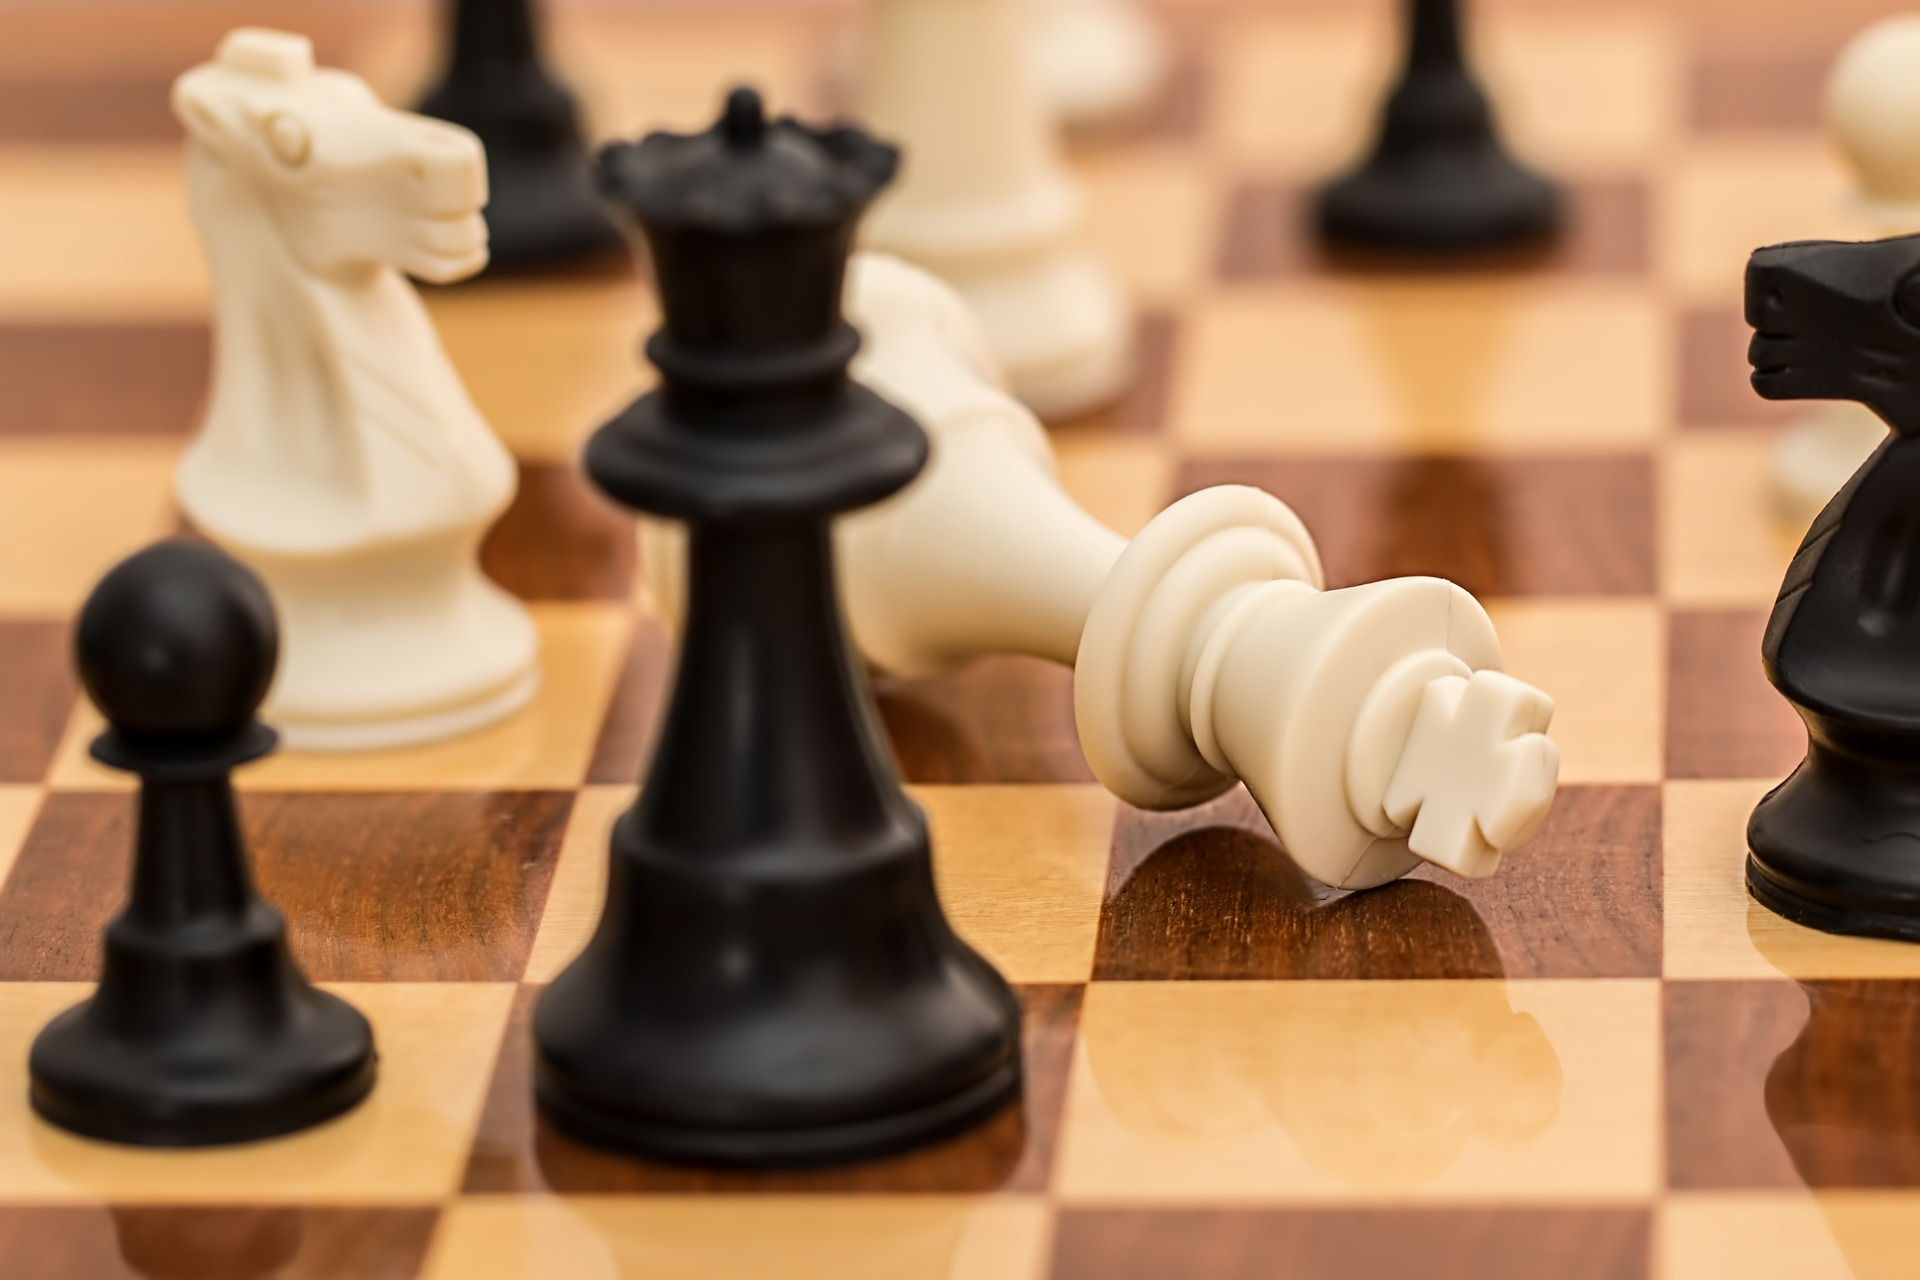 checkmate-1511866_1920.jpg